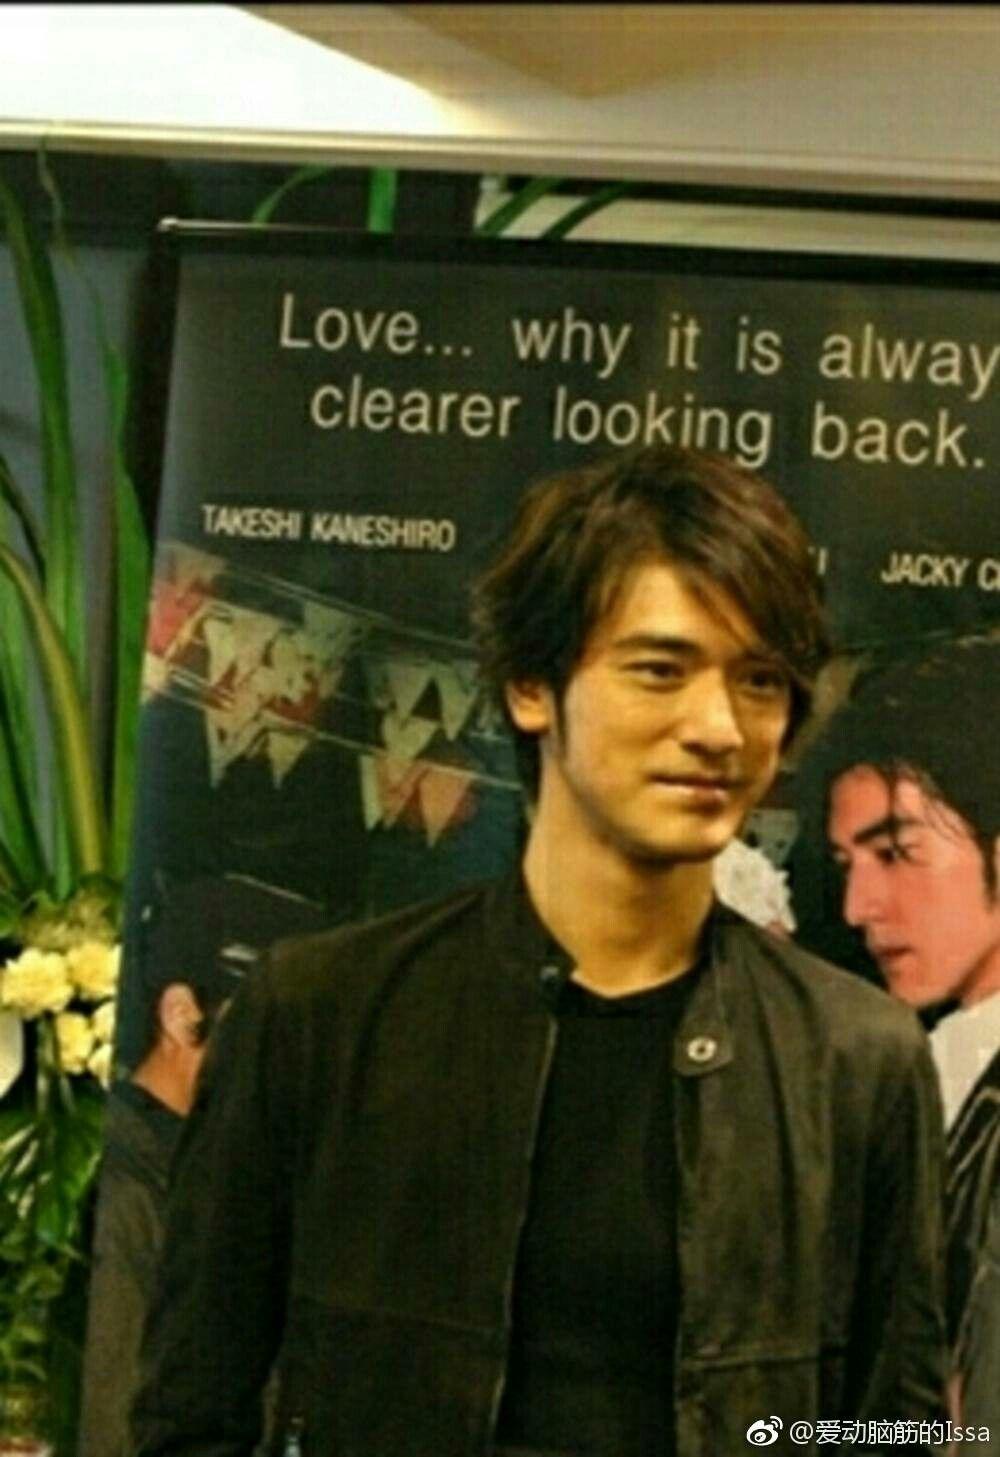 takeshi peter chan ji jin hee in bangkok thailand 2005 at siam paragon department store for perhaps love promotion 金城武 アイドル